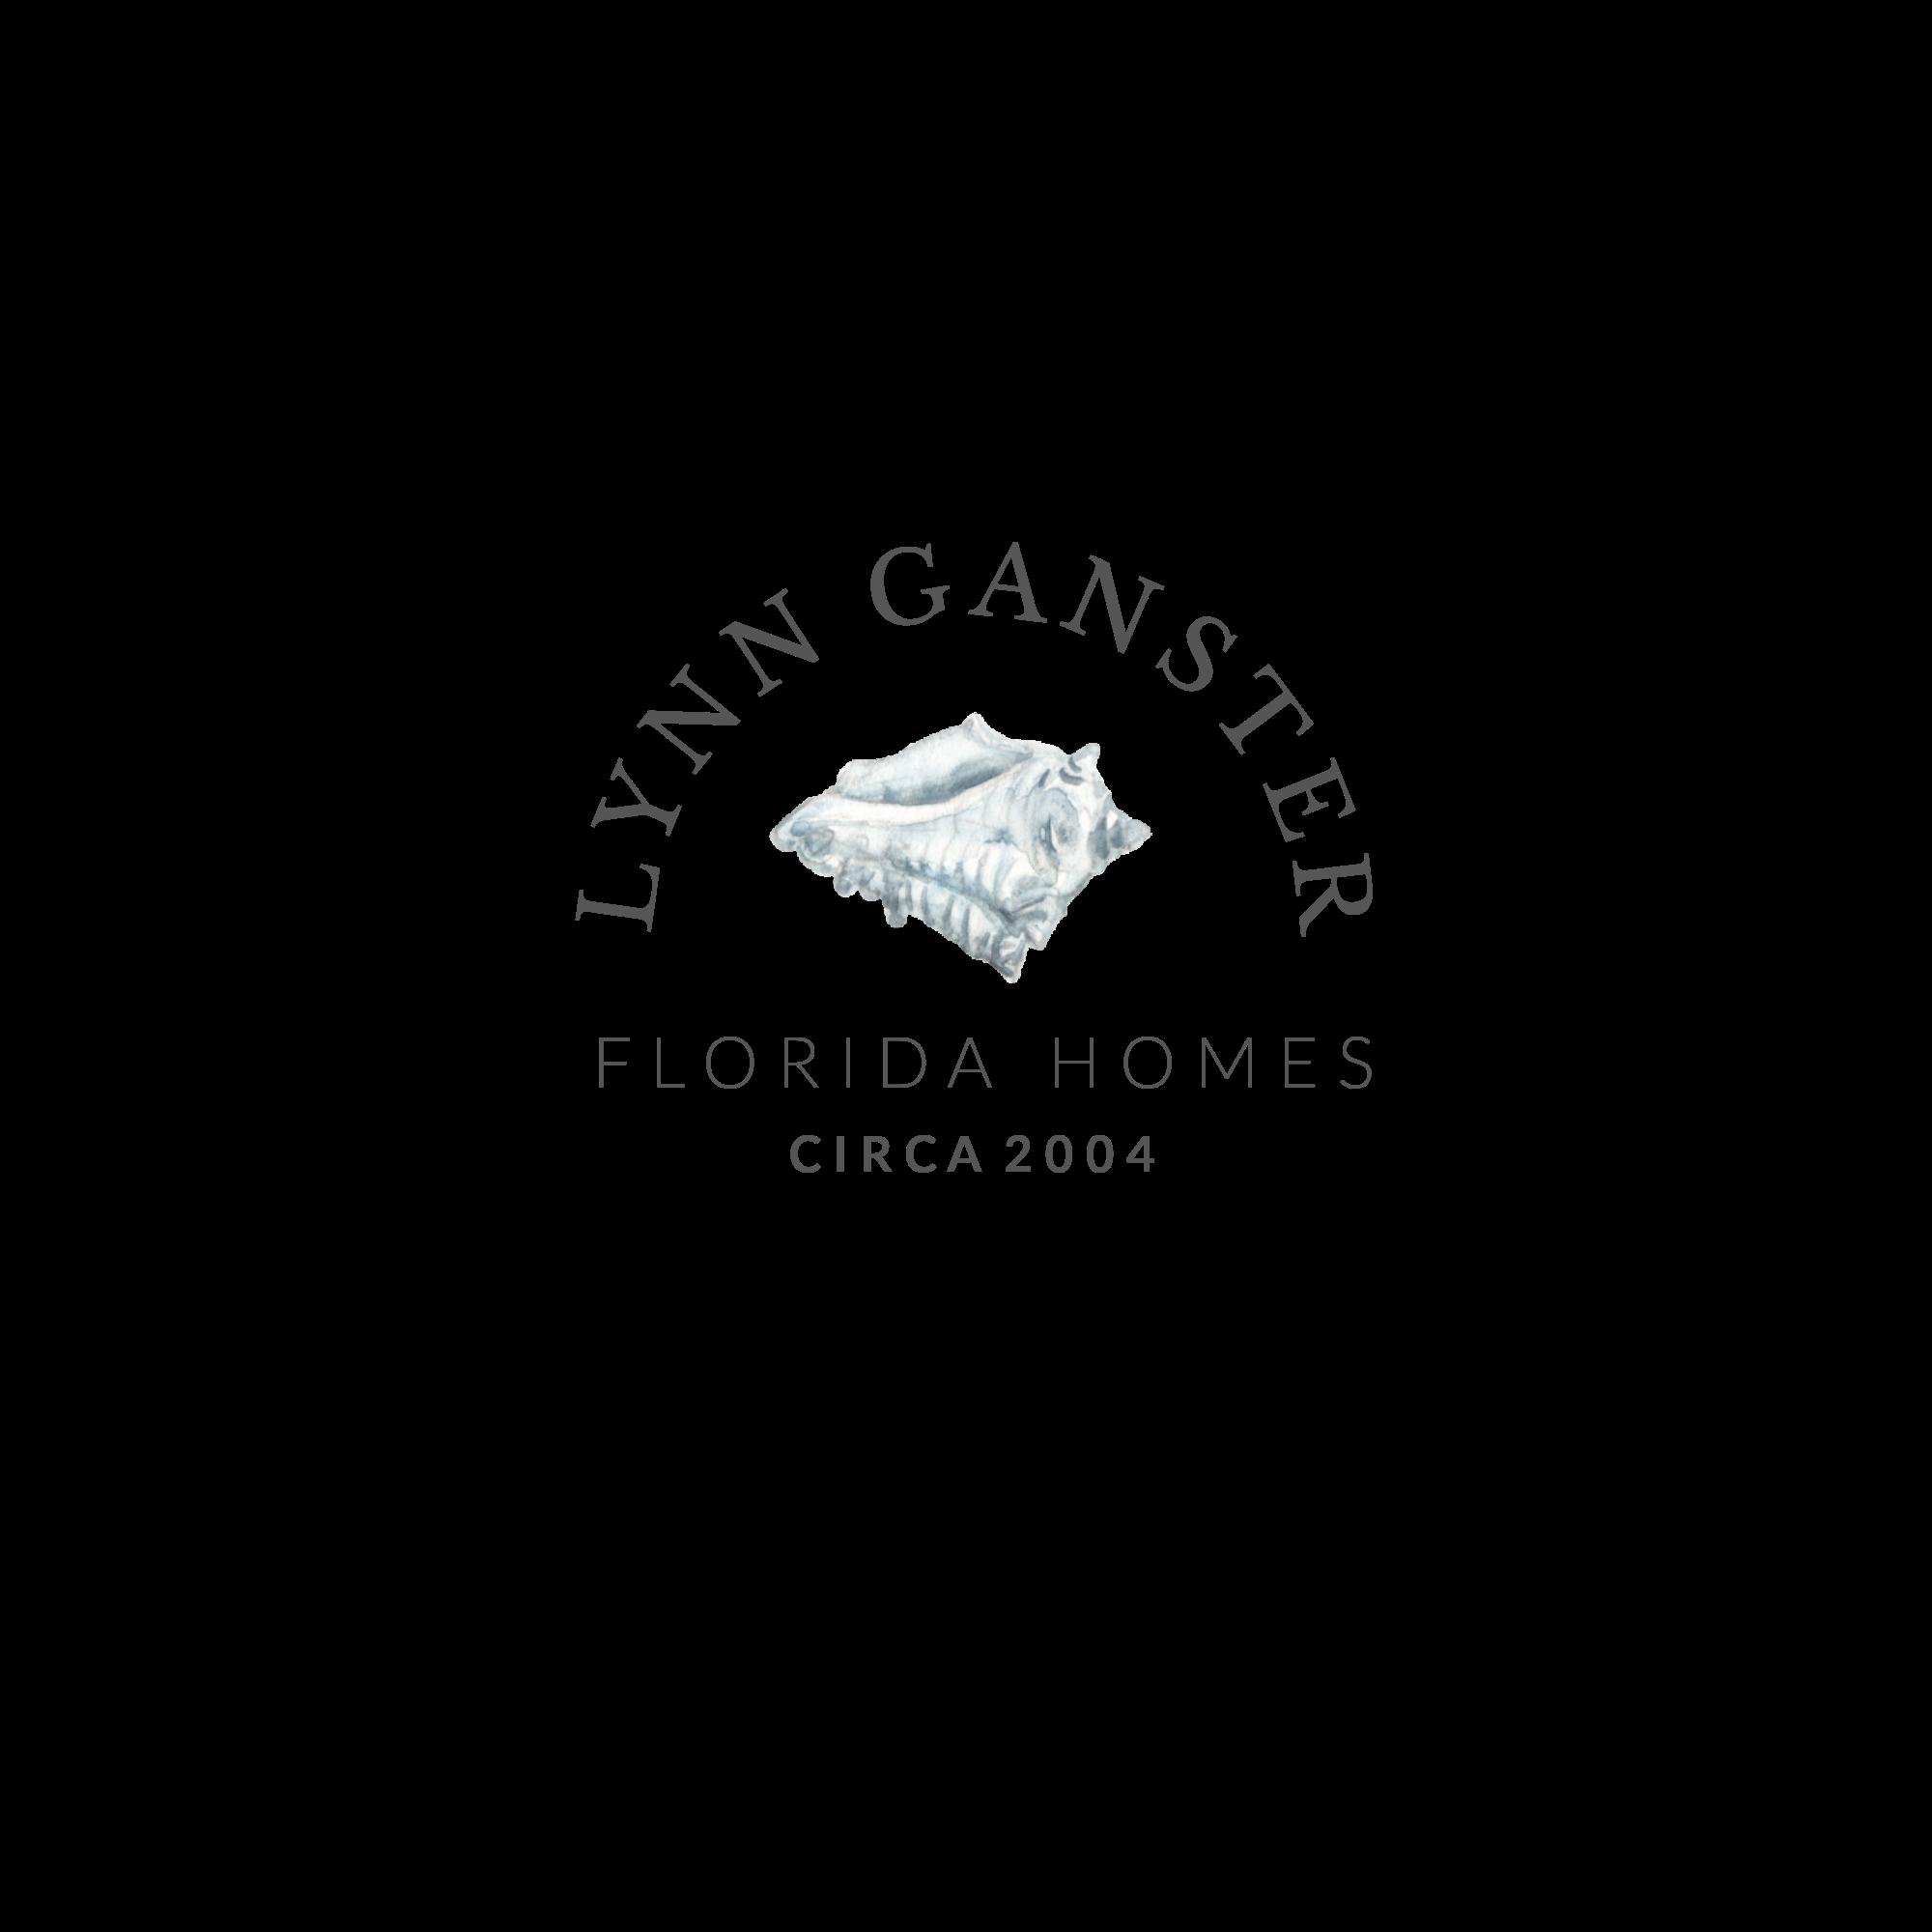 Lynn Ganster shell logo png.png